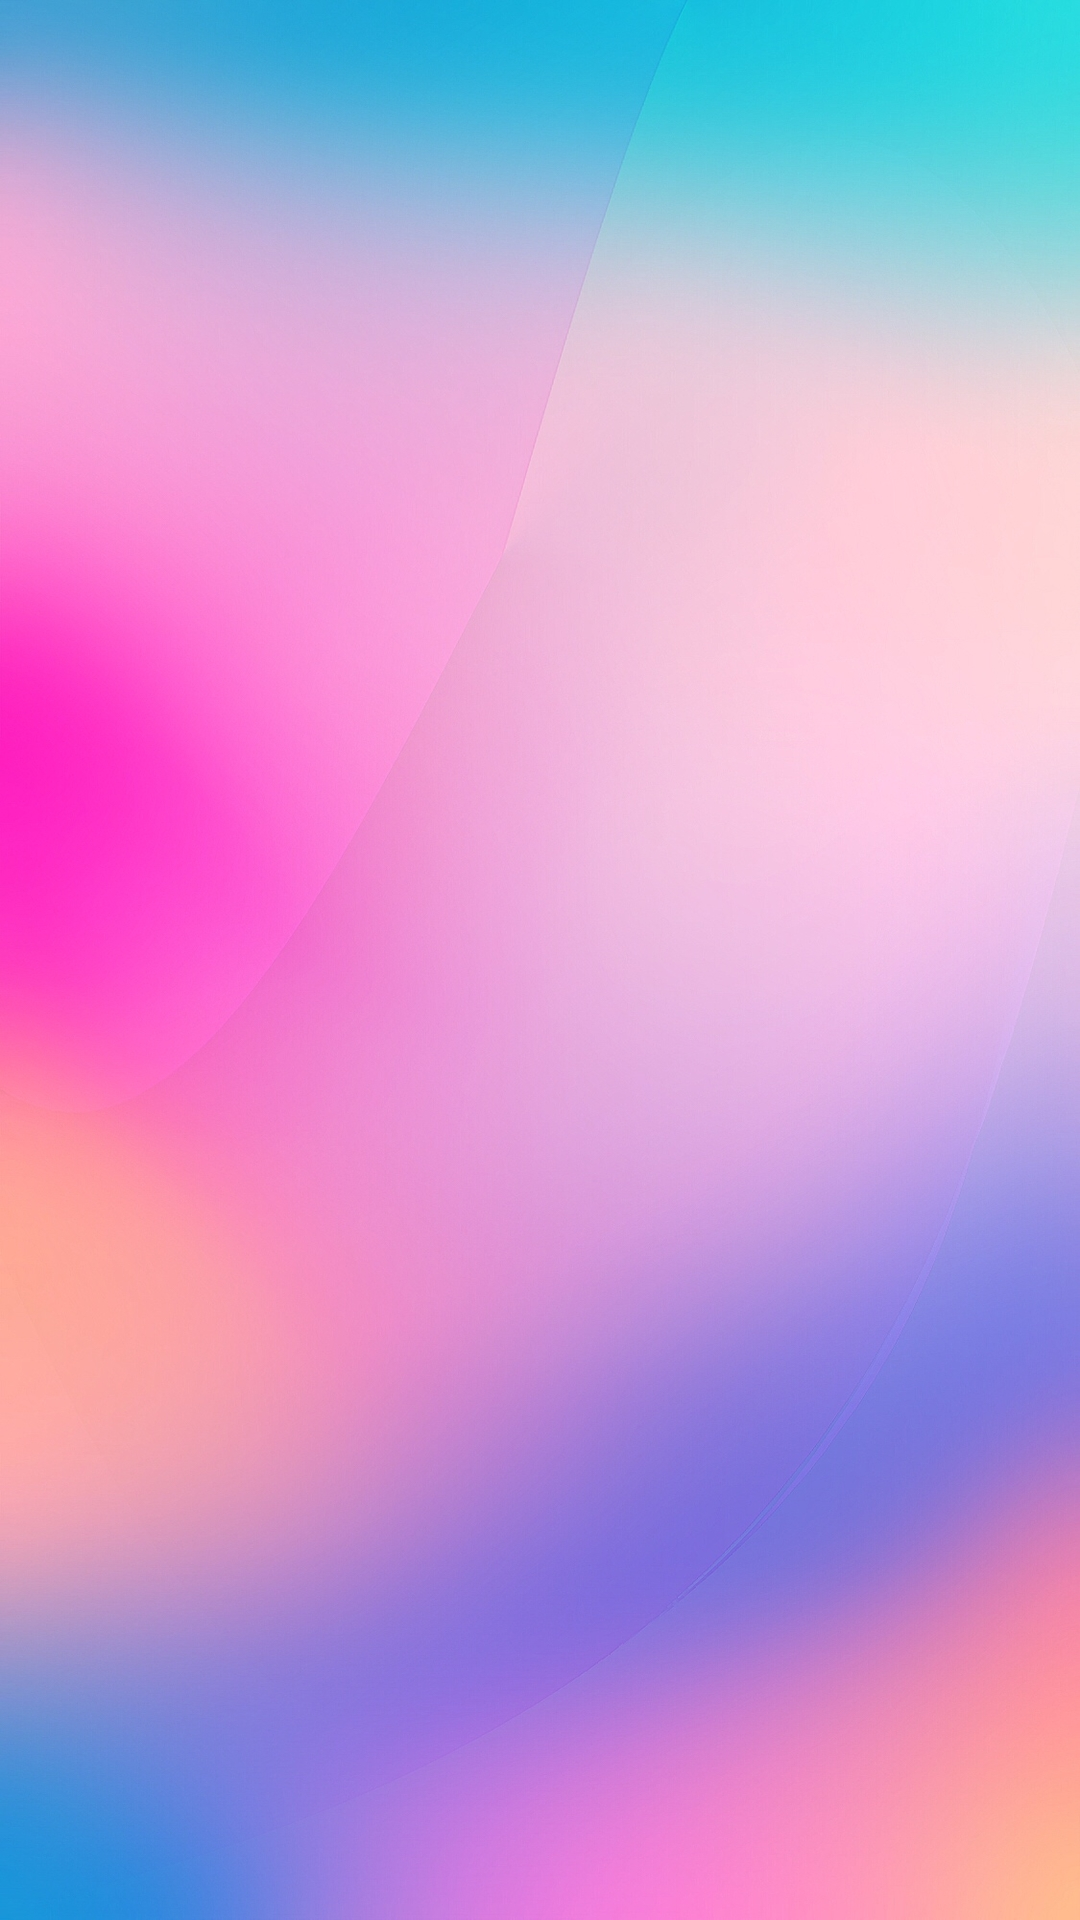 Apple Iphone X Wallpaper خلفيات لمزيج من الألوان المتناغمة لهاتف Iphone عالم آبل